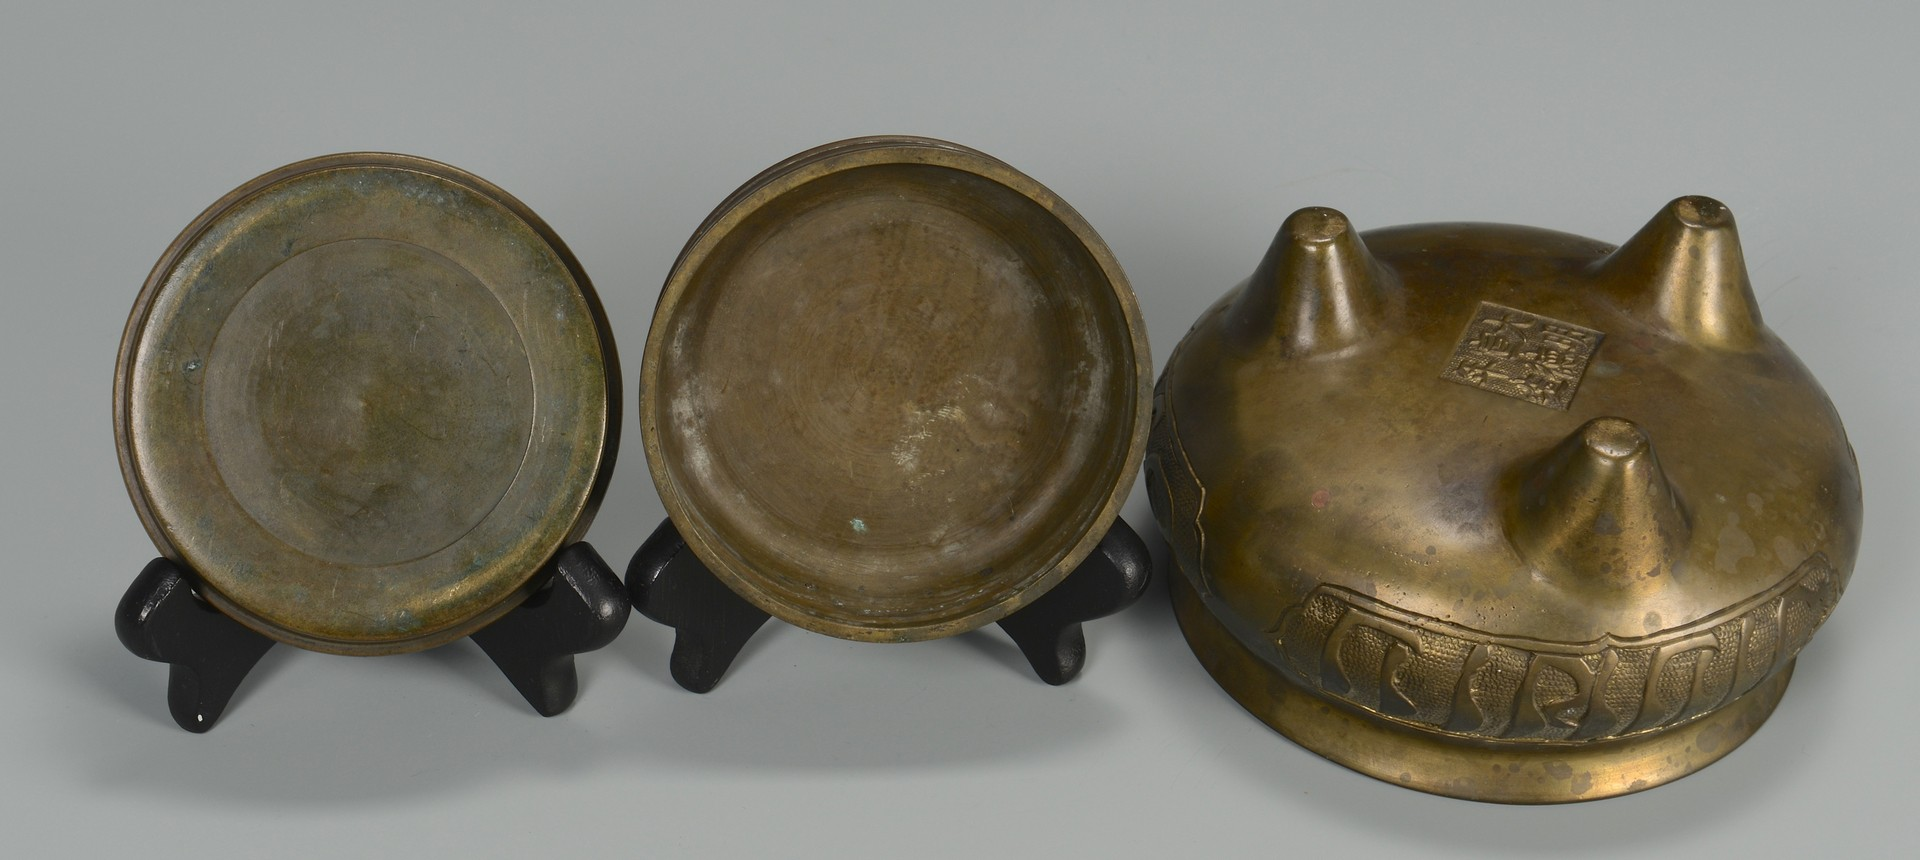 Lot 3594160: 2 Chinese Bronze items, Arabic Script